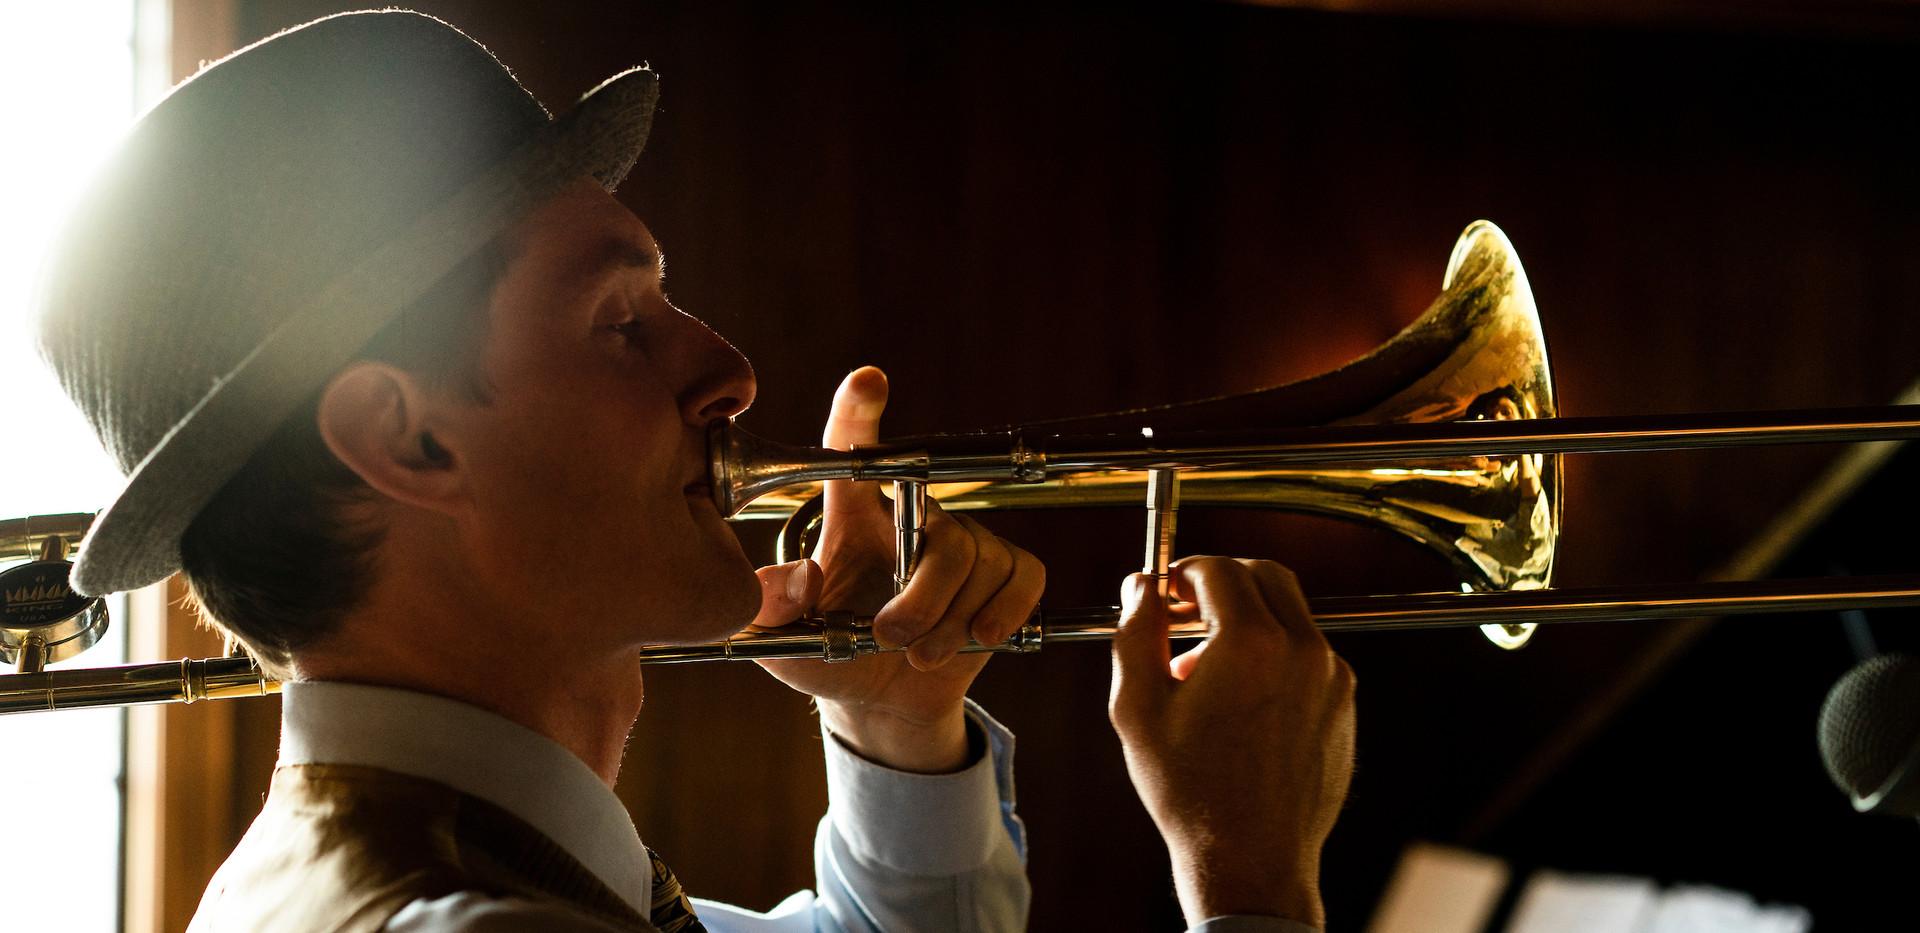 James Plays Trombone